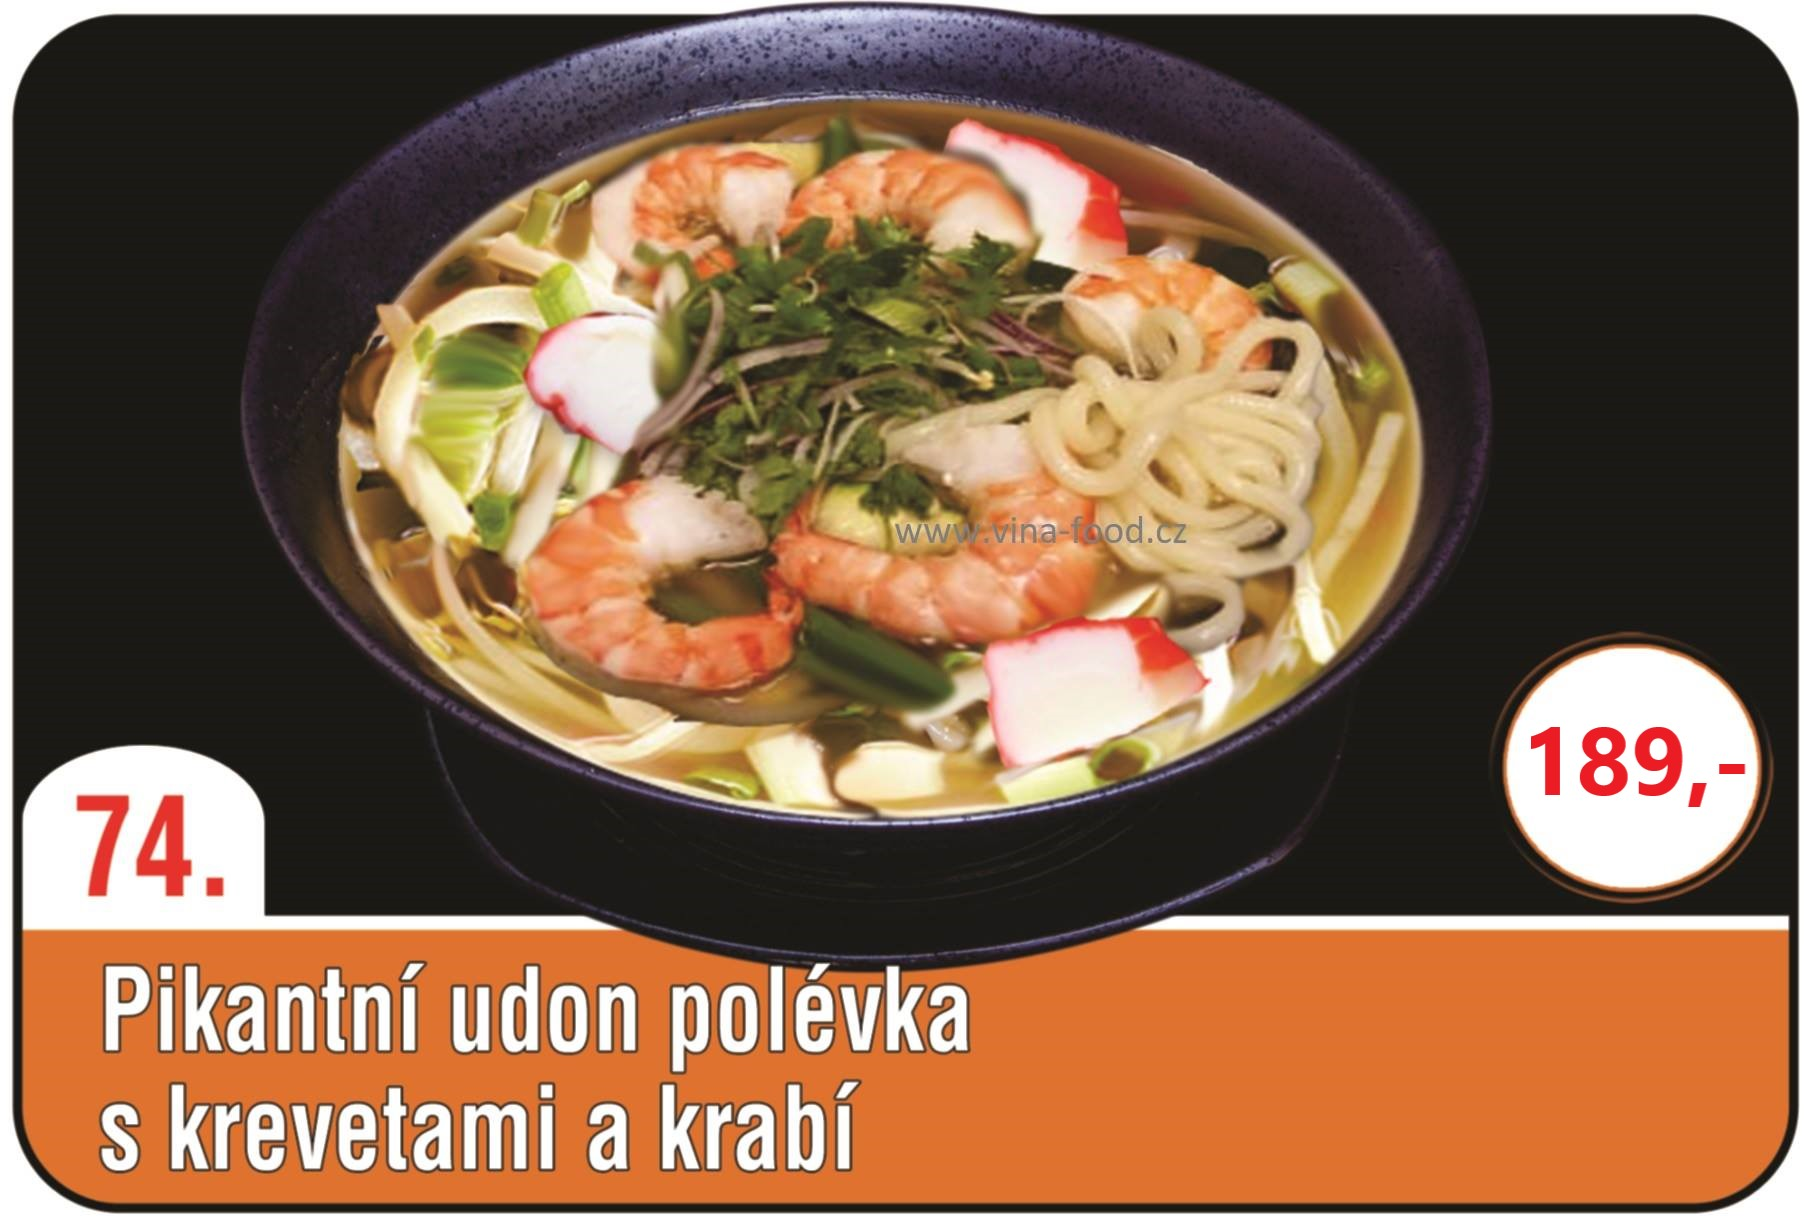 Pikantní udon polévka s krevetami a krabi